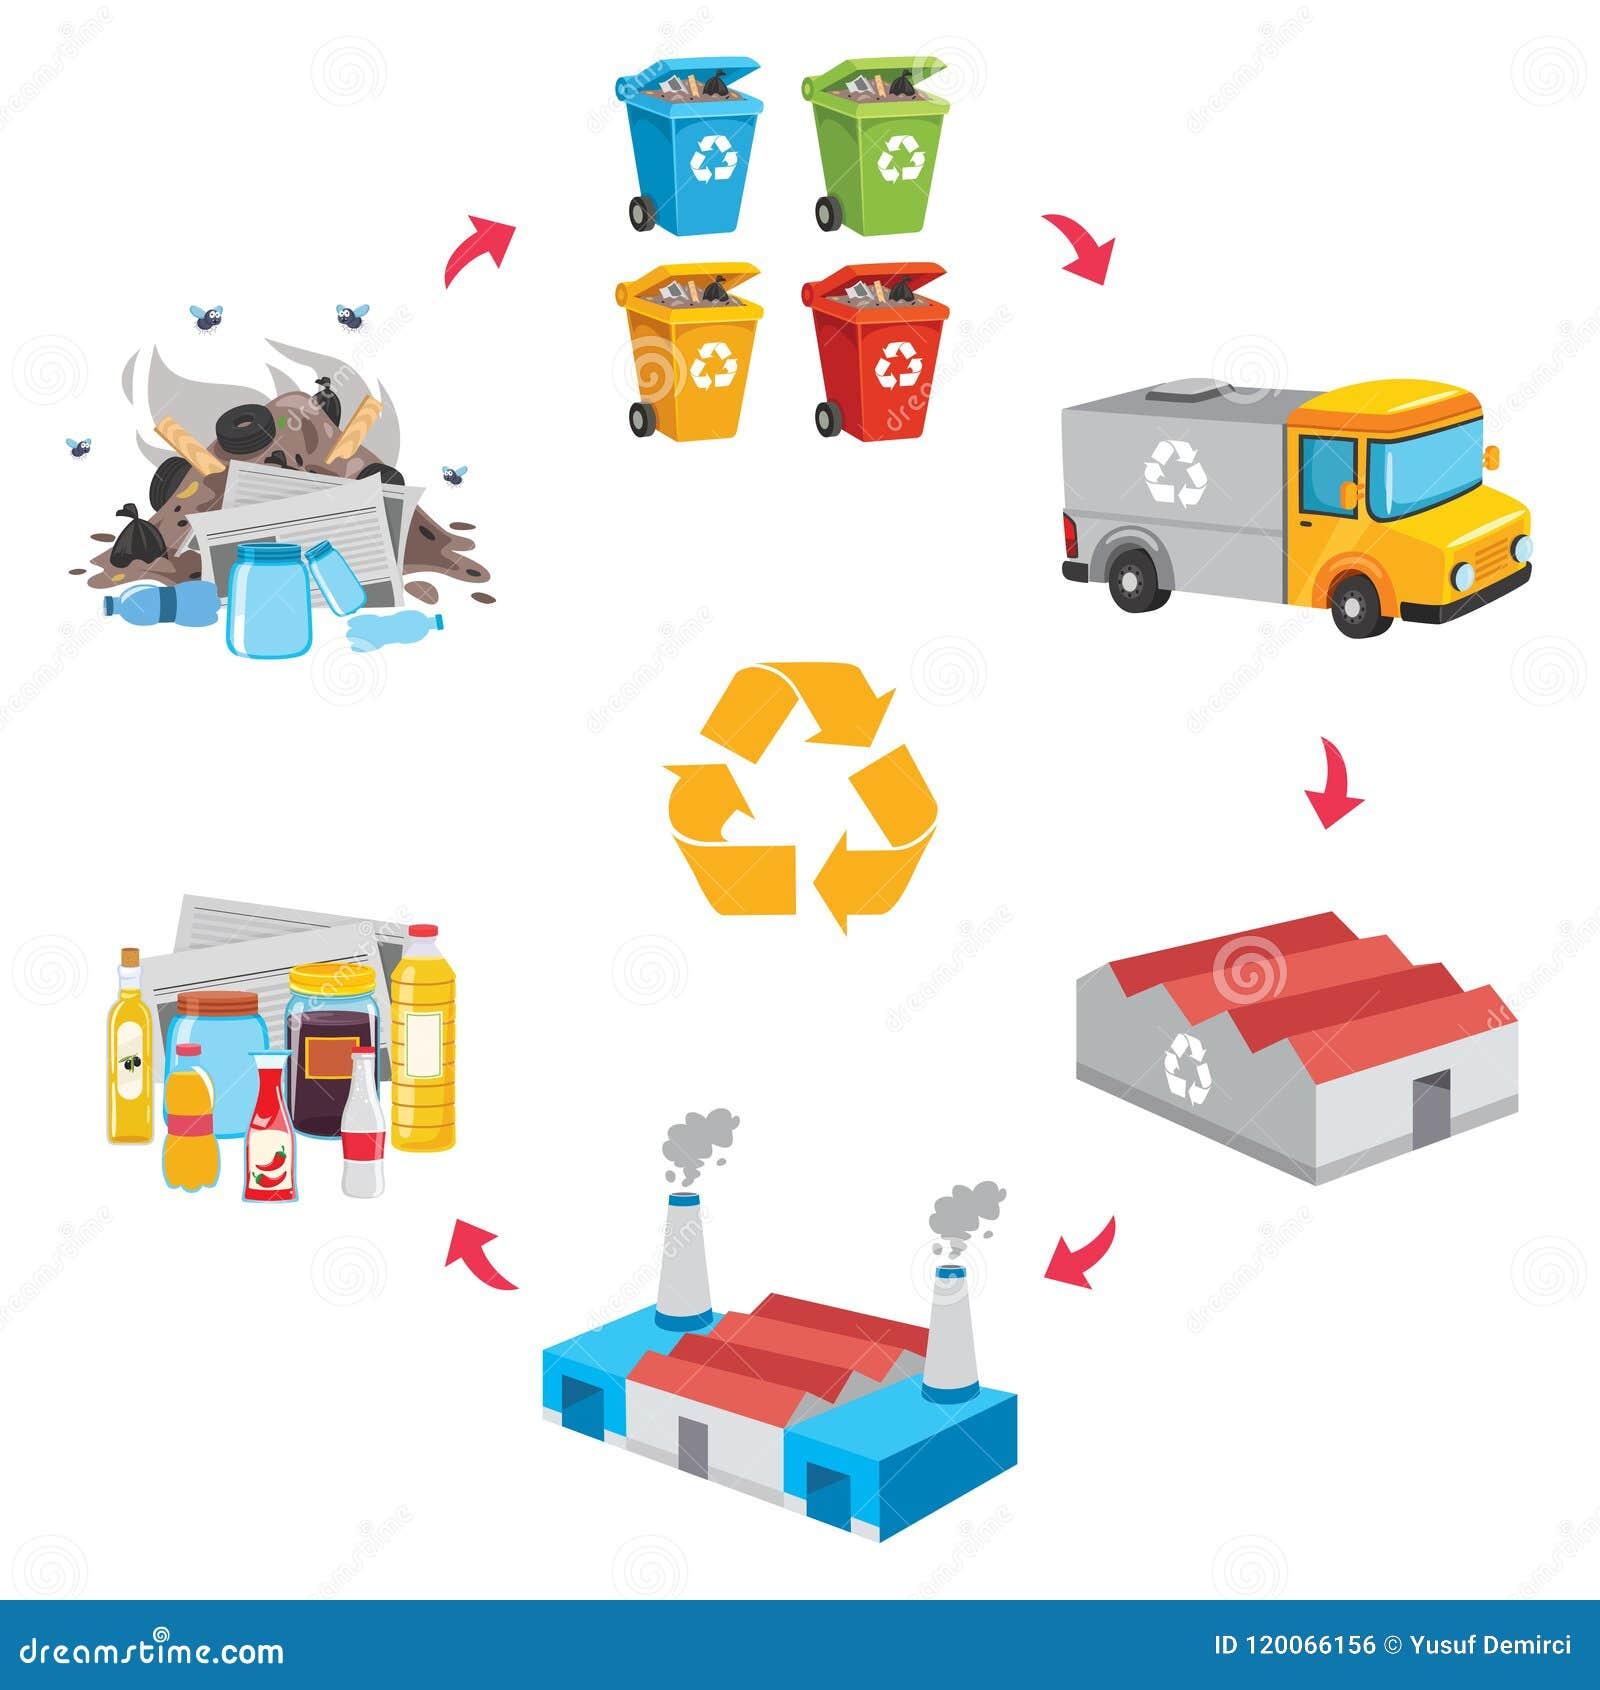 Vectorillustratie van Afval Recyclingsprocédé